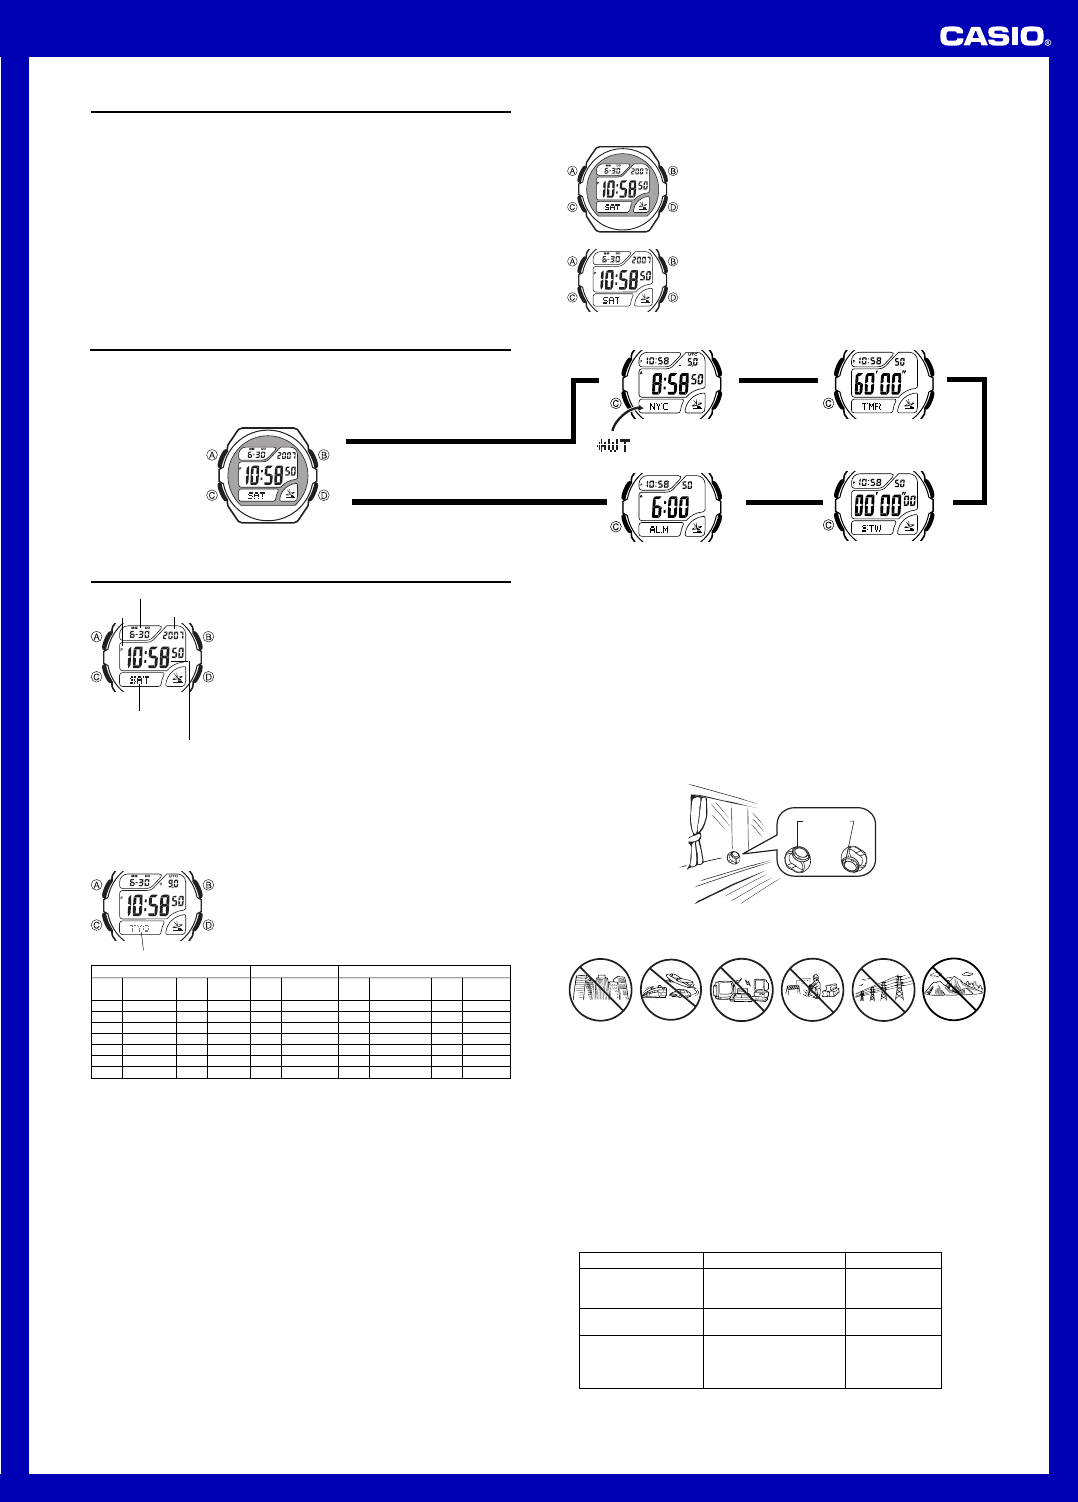 instrukcja obs ugi casio wv 58e 1avef rh instrukcjaobslugipdf pl Casio Exilim User Manual casio wave ceptor wv-58a manual